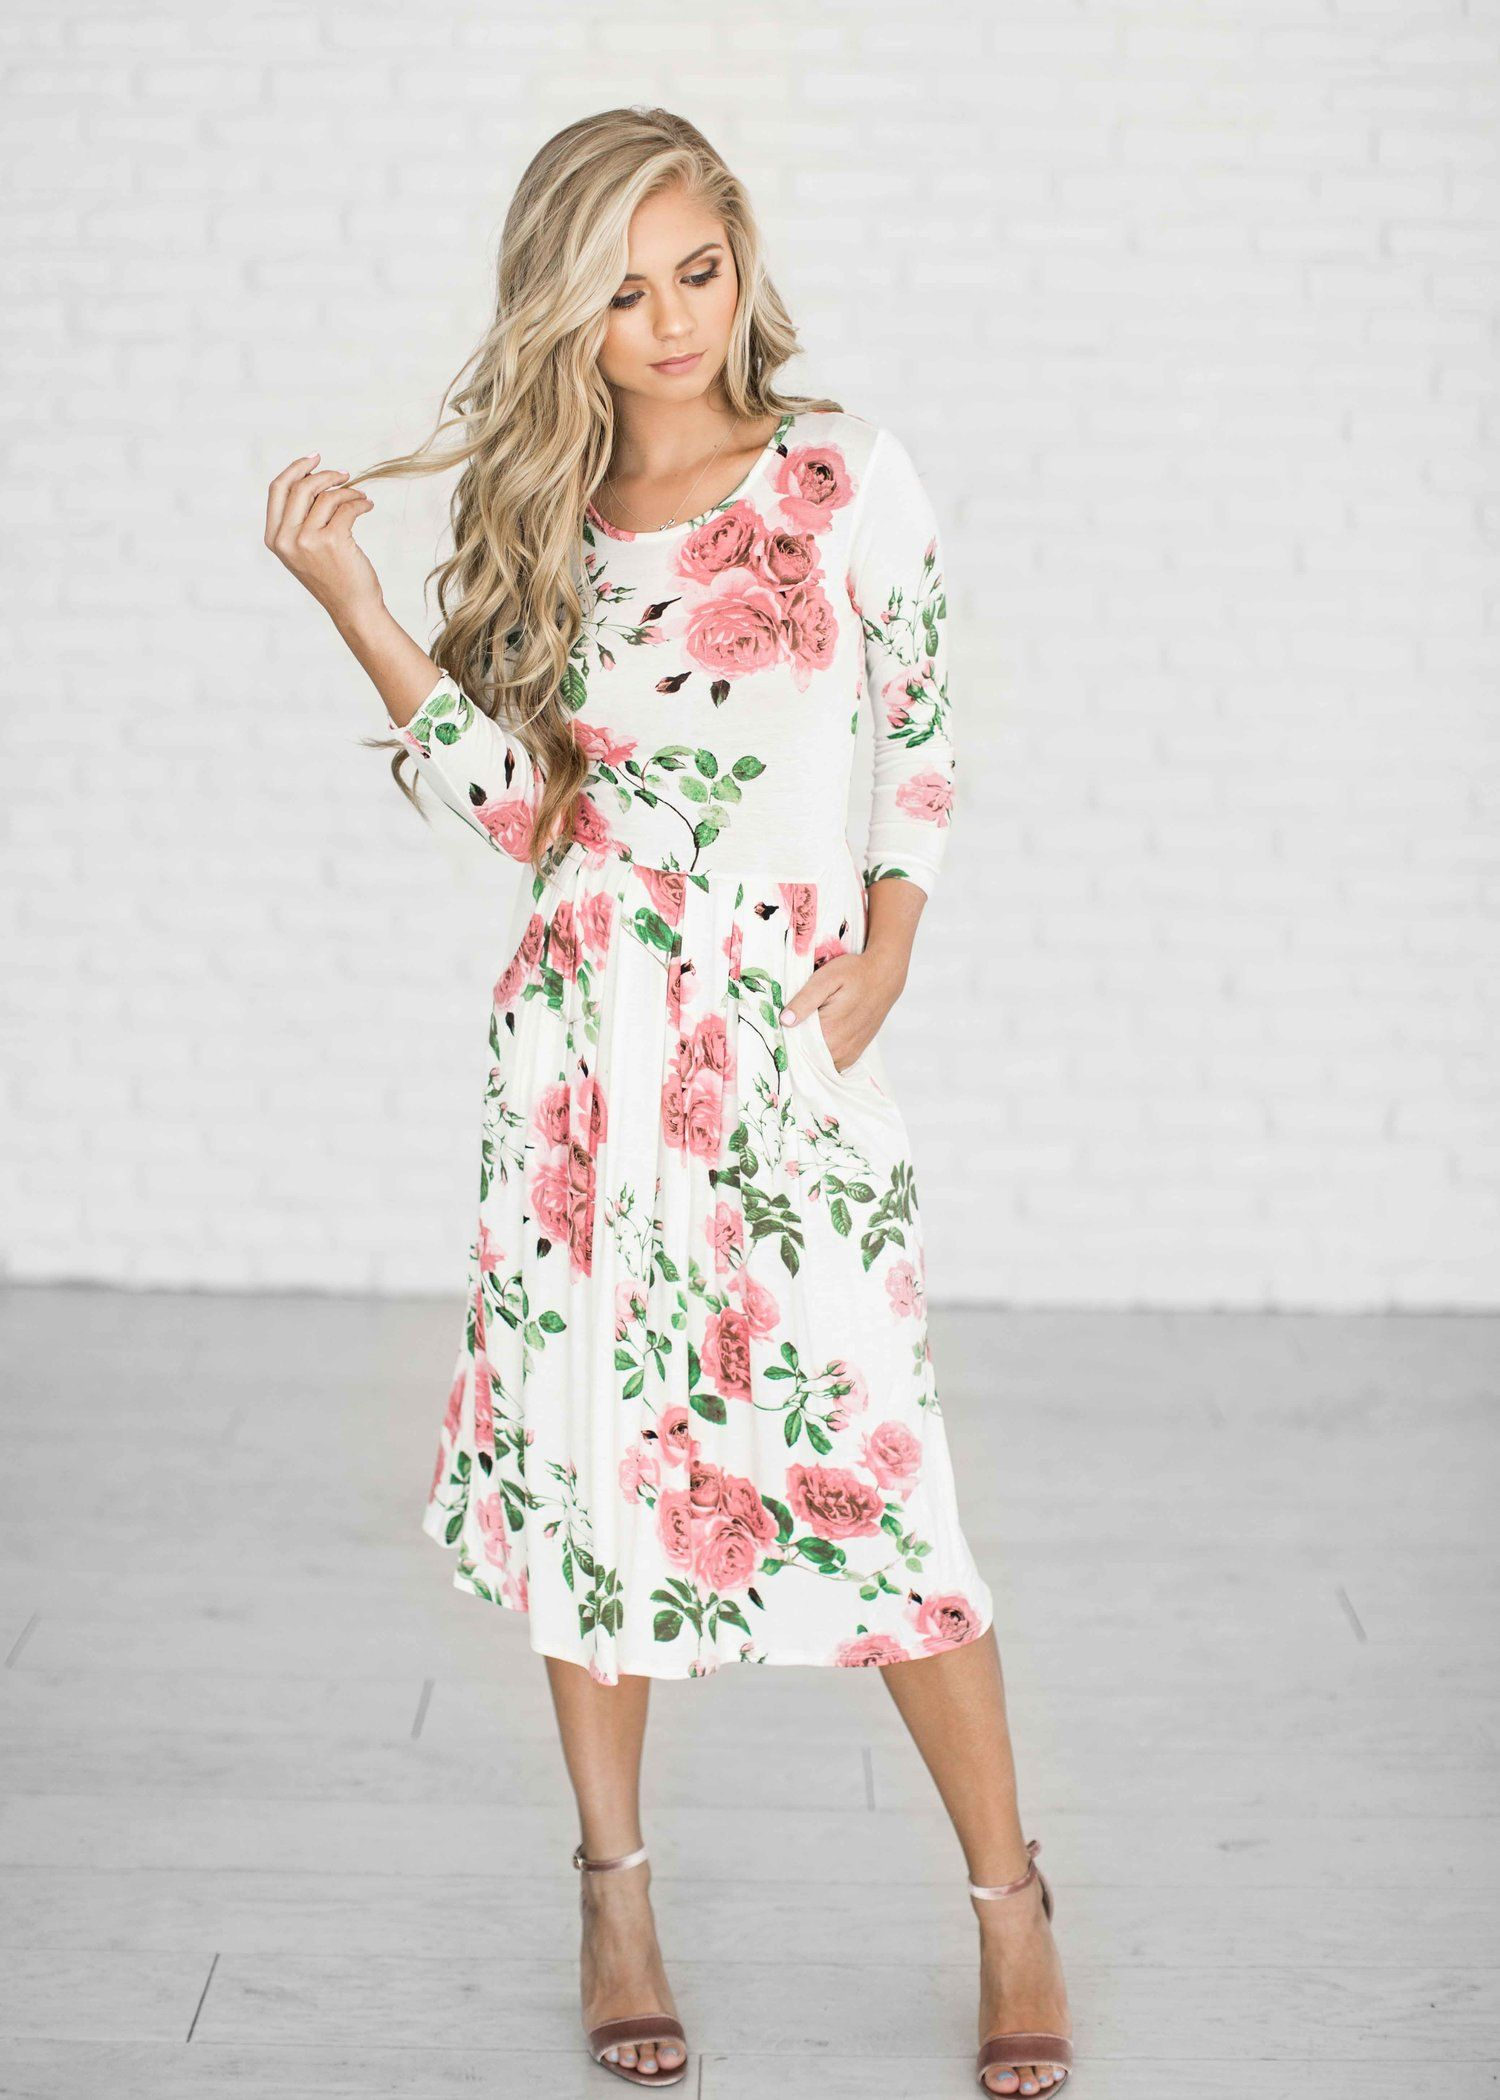 Floral Sky Maxi Dress   Sunday dress, Spring dresses and Fashion ...